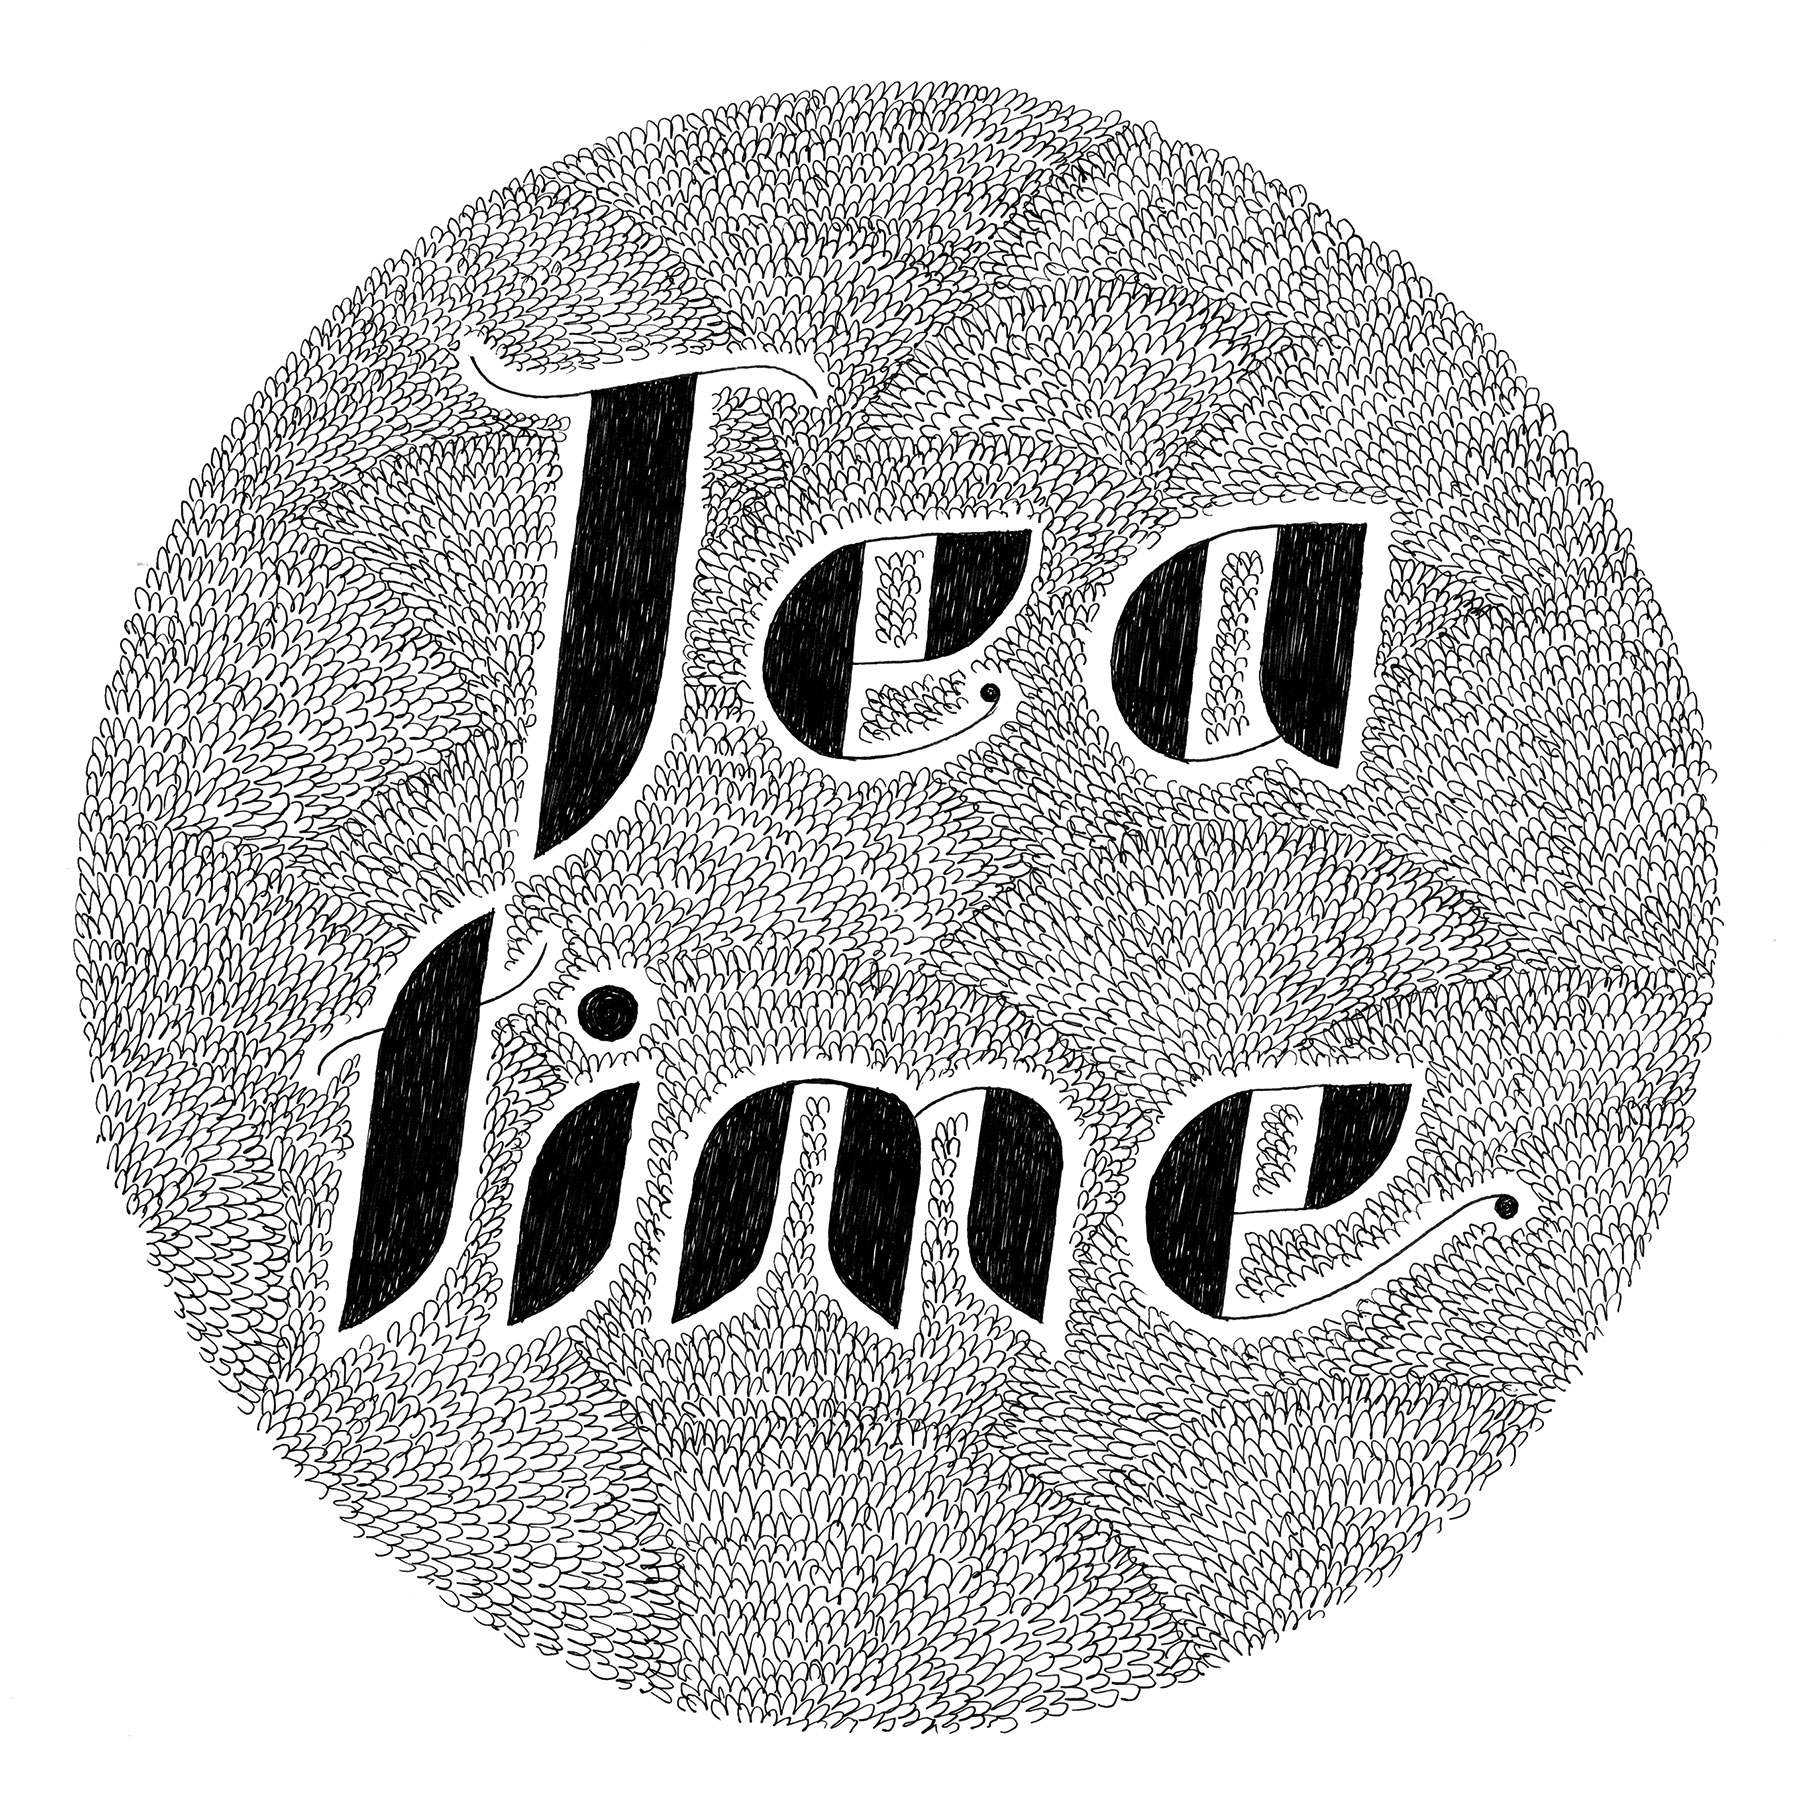 Teatime-for_web_2-LARGE-300dpi.jpg